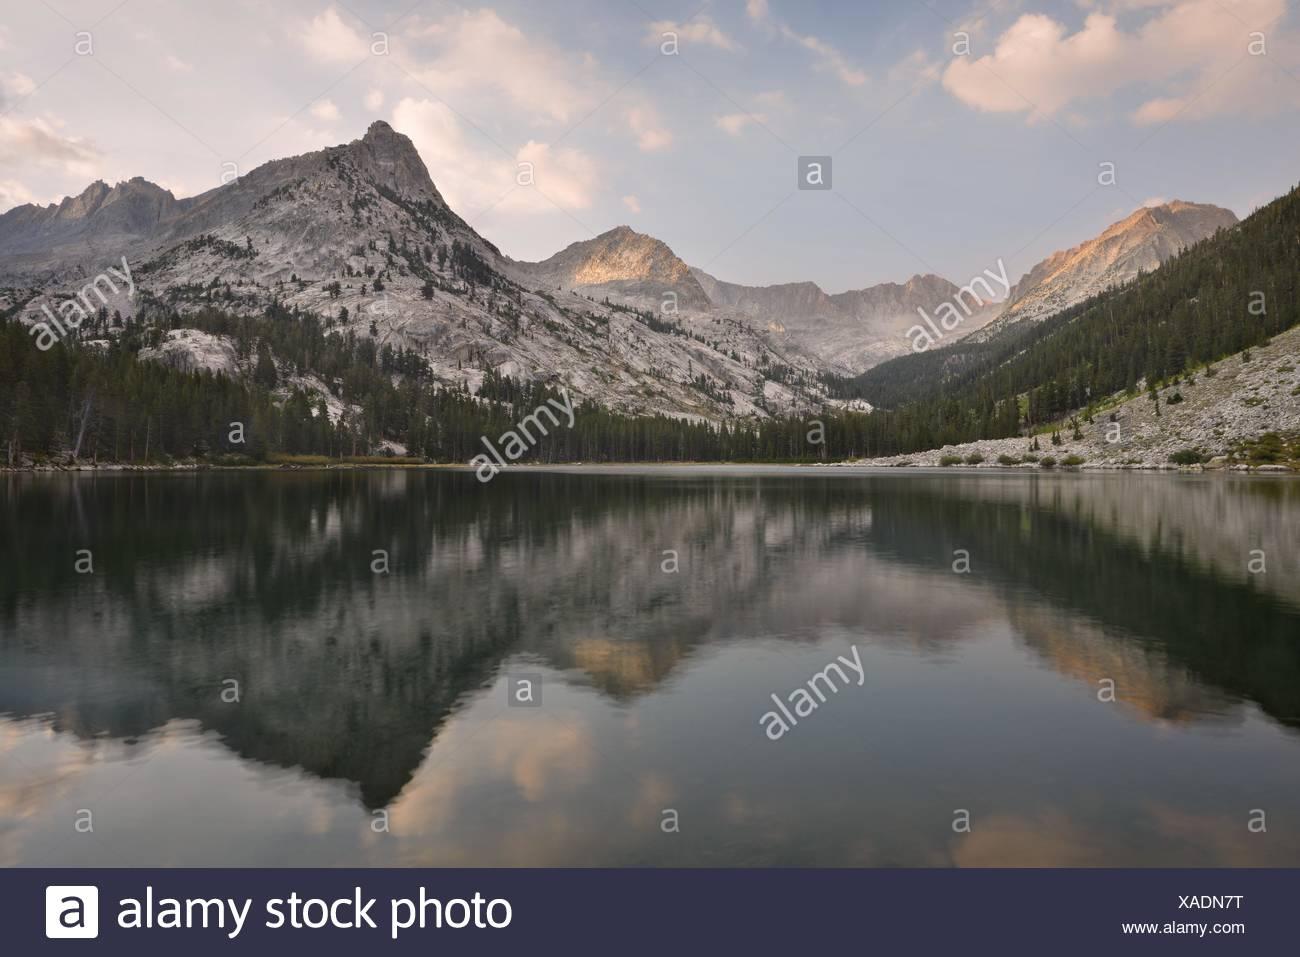 USA, California, Kings Canyon National Park, Reflexionen im Ost-See Stockbild